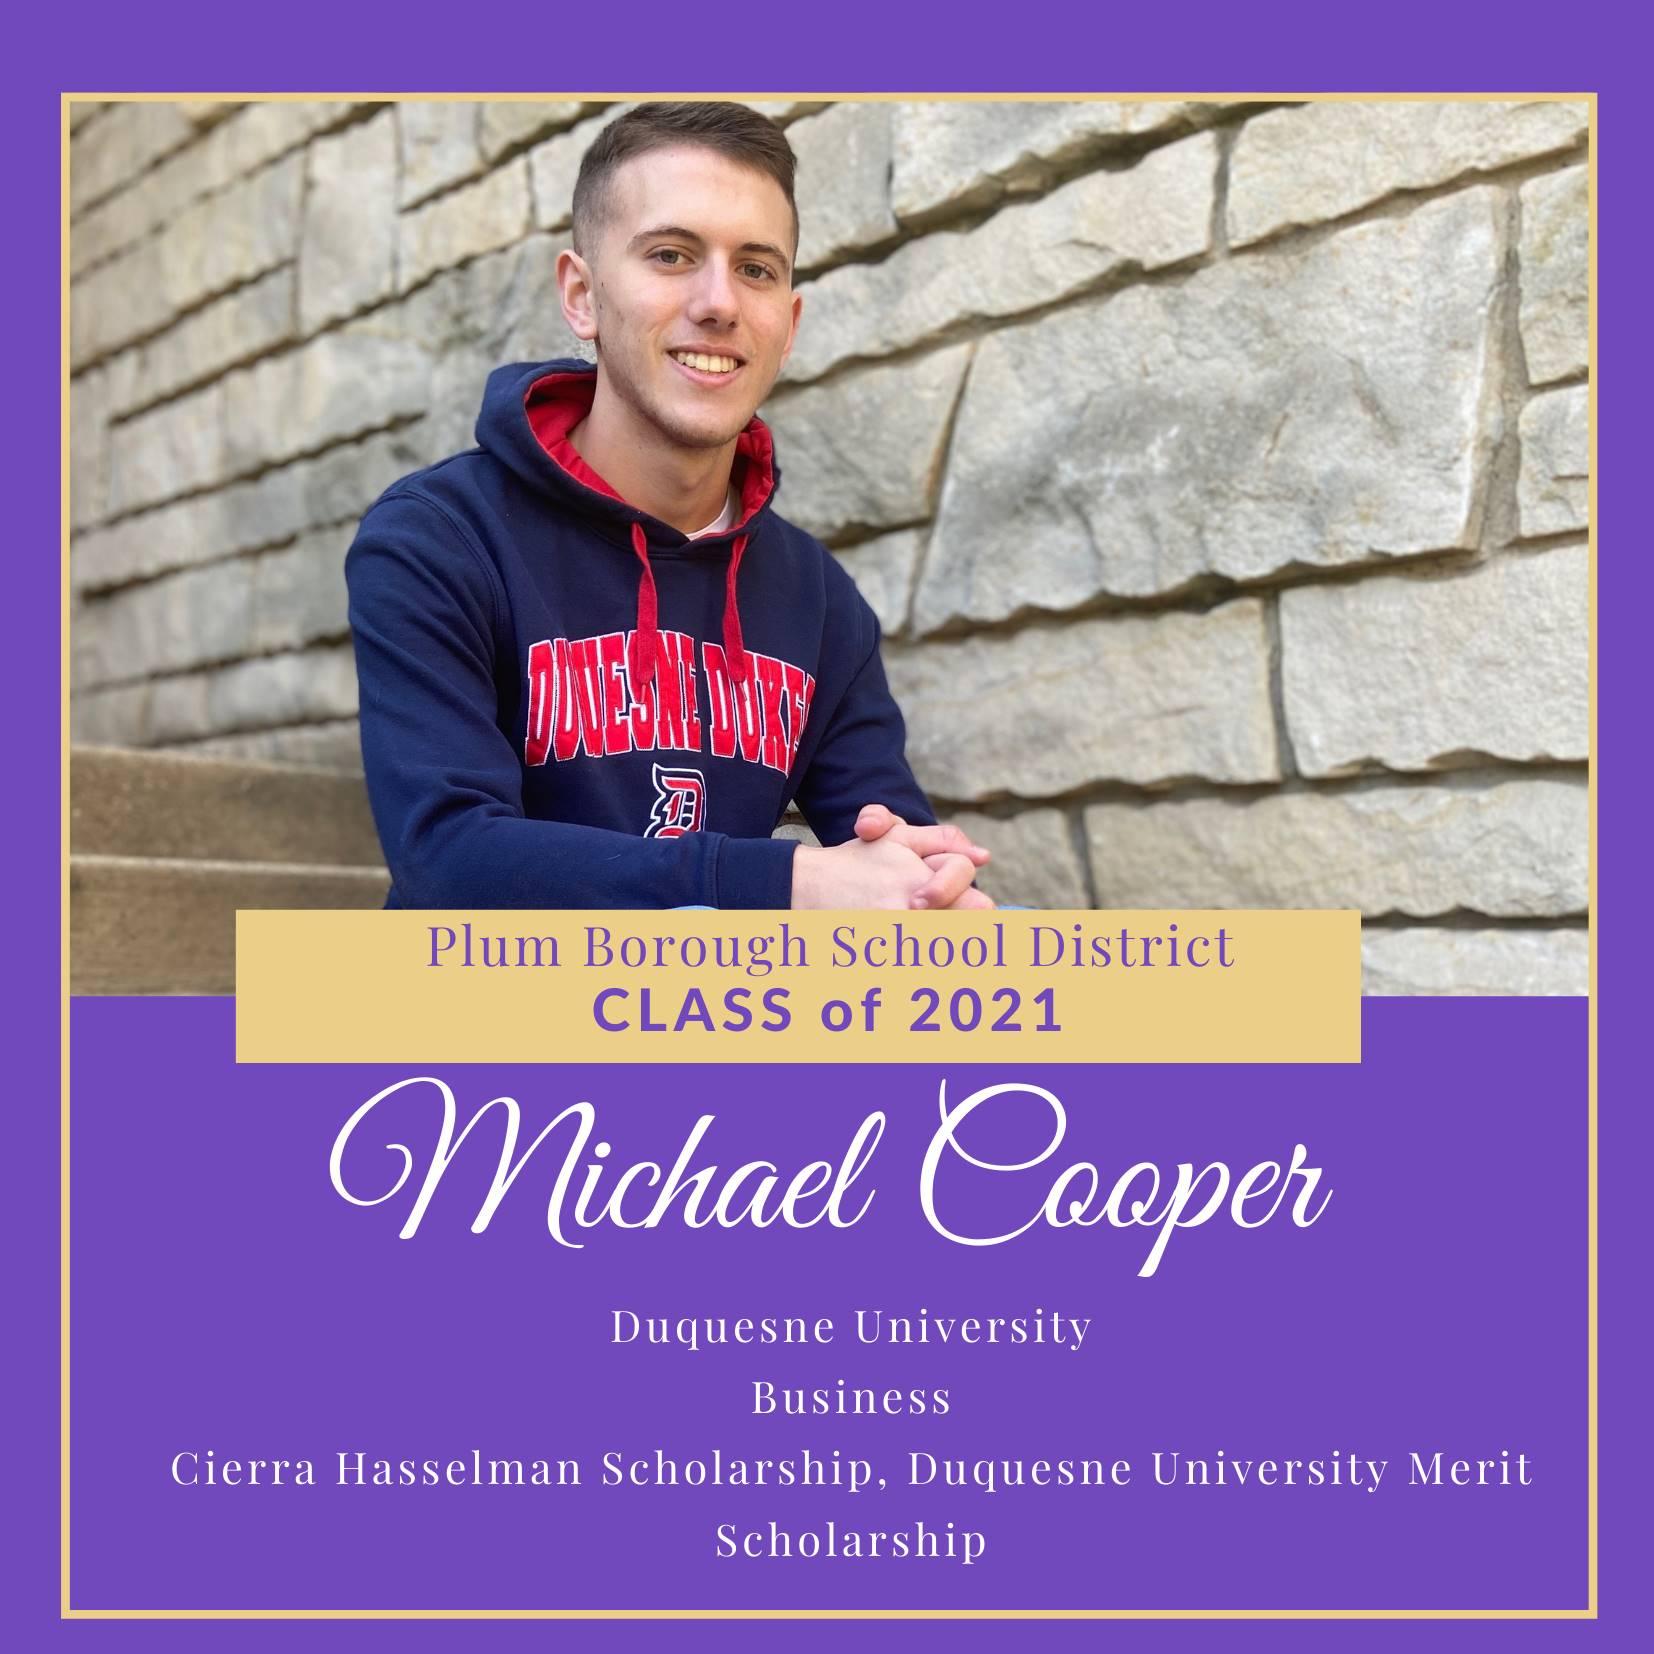 Congratulations to Michael Cooper, Class of 2021!